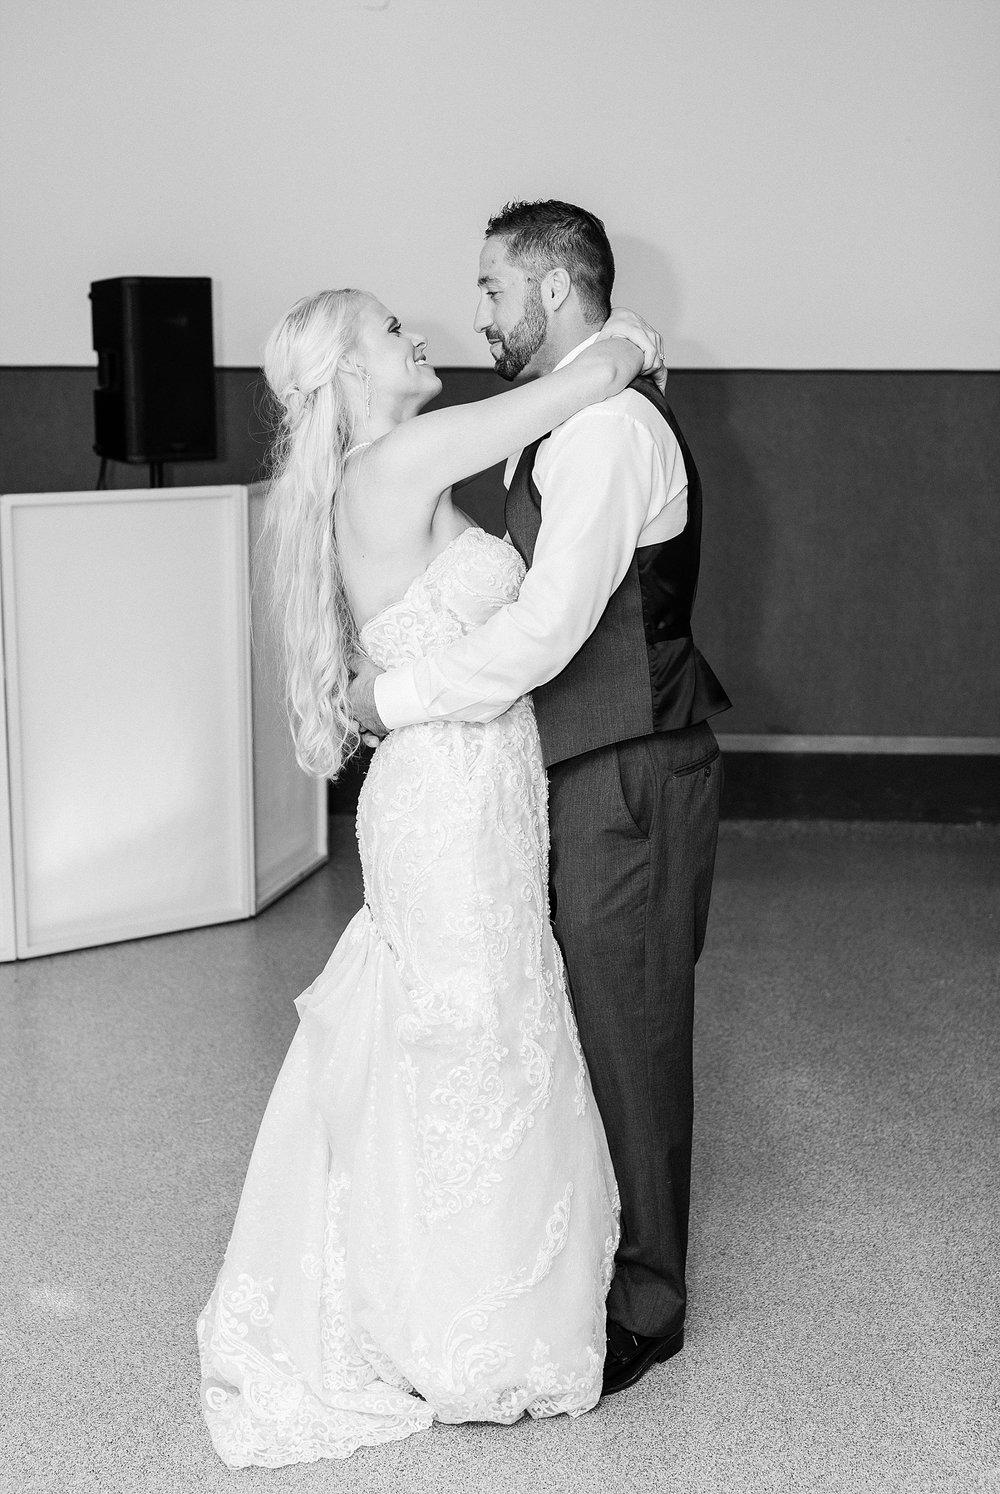 Alan and Heather Horn Wedding by Kelsi Kliethermes Photography Associate - Rachel_0048.jpg